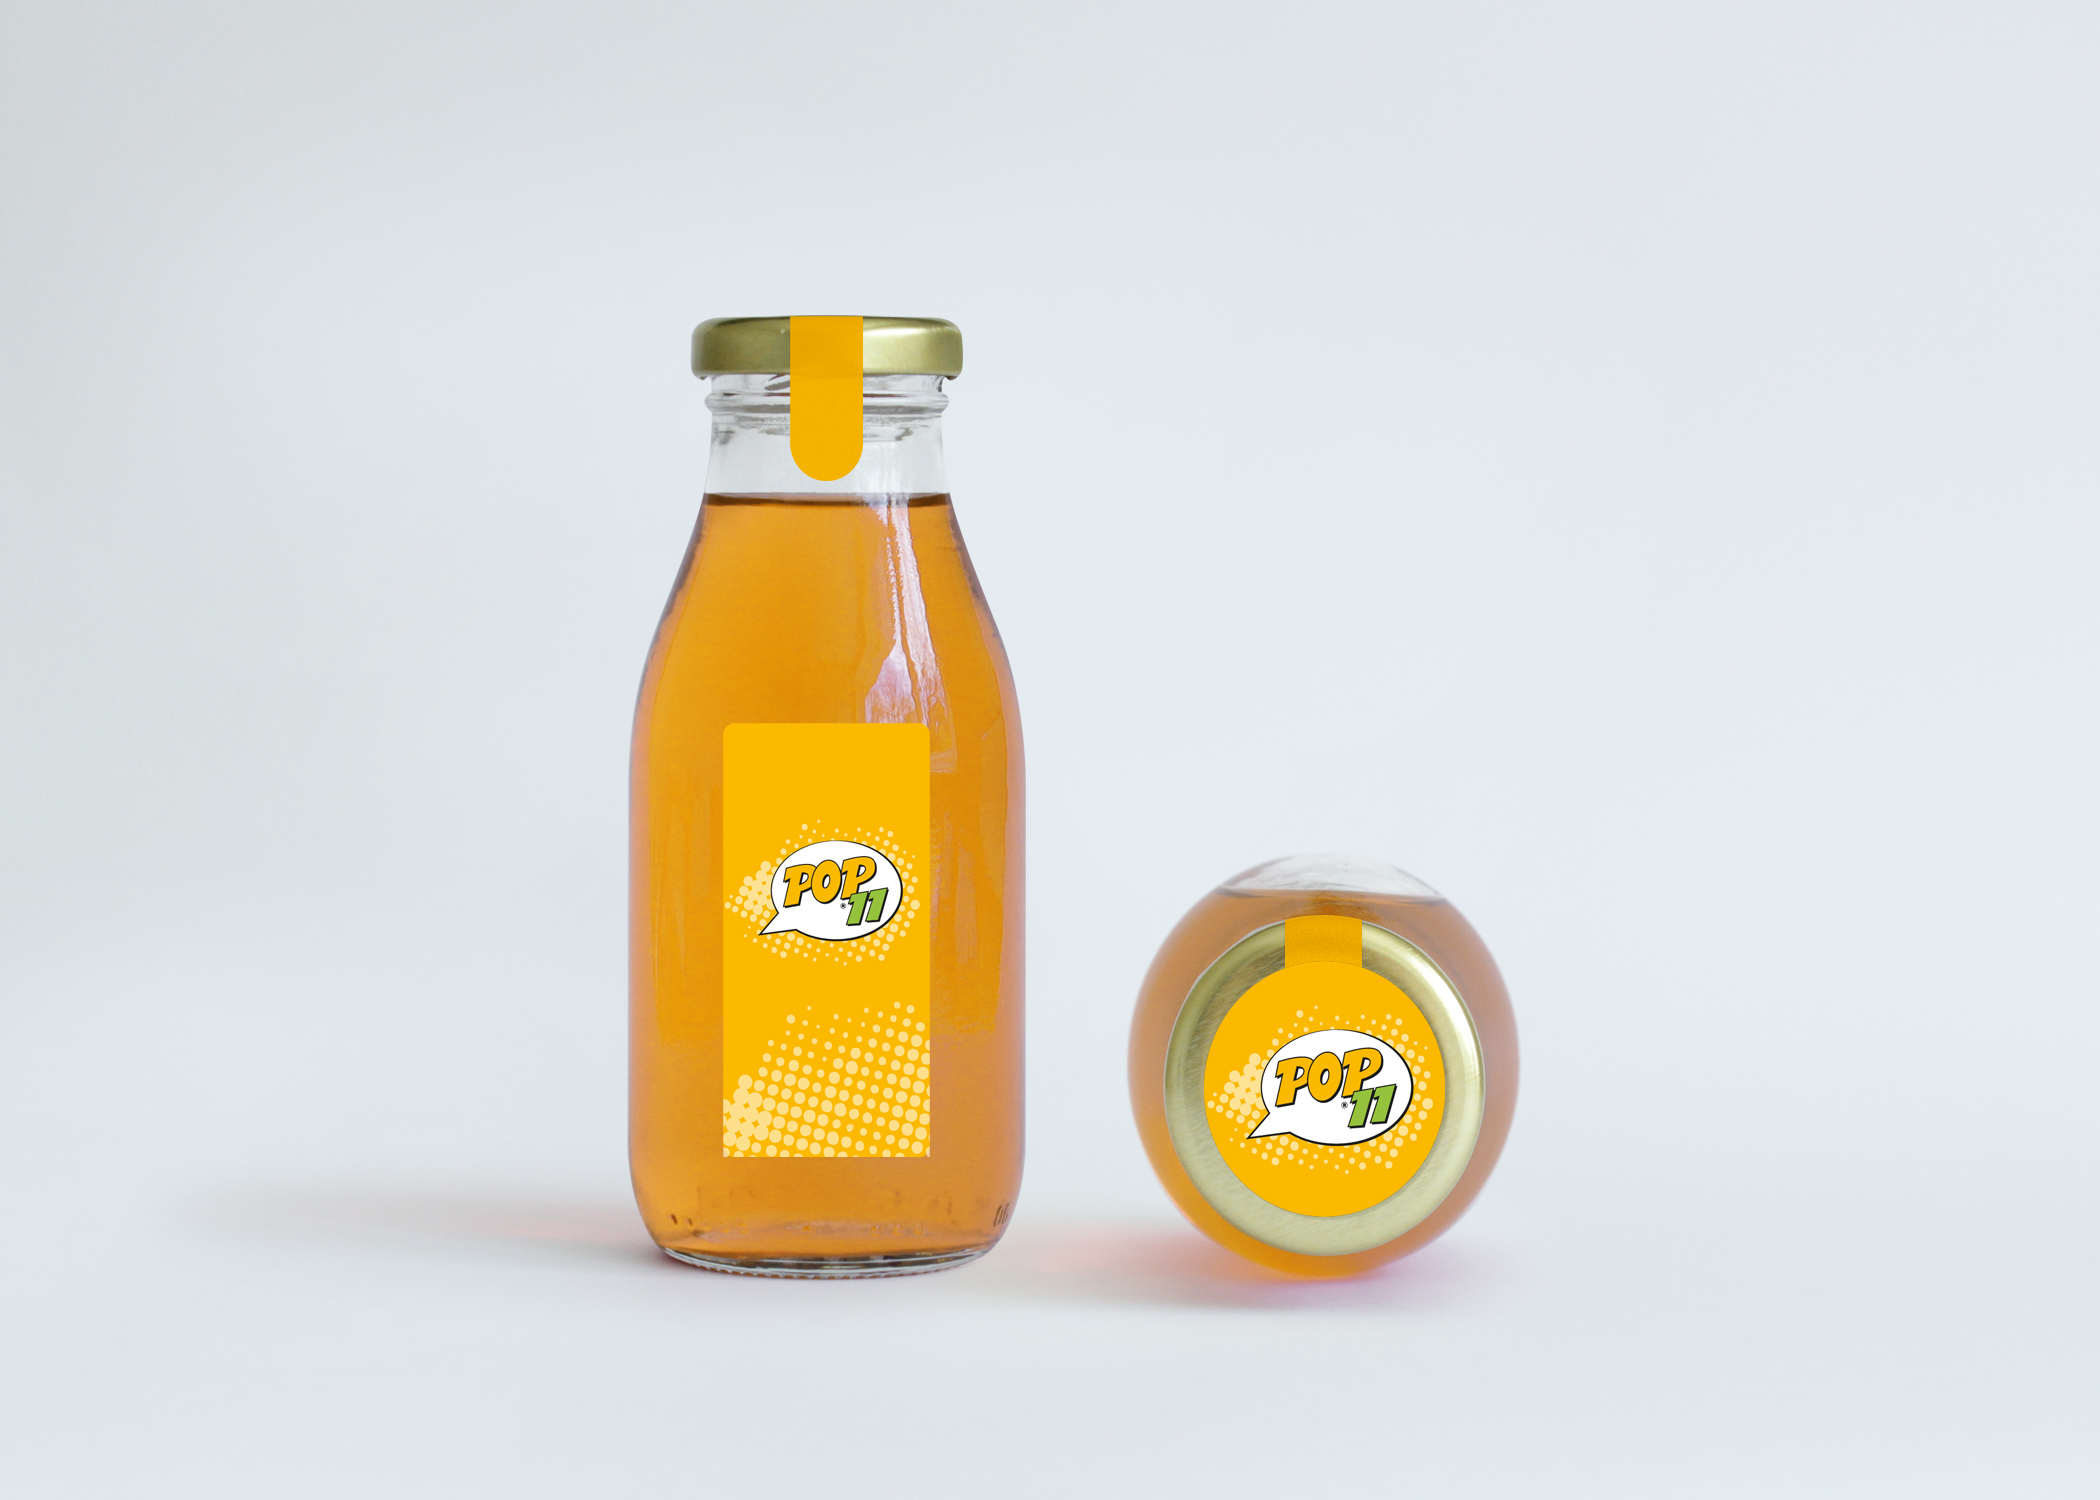 04 Pop11 Digital Prints Stickers Glass Jar